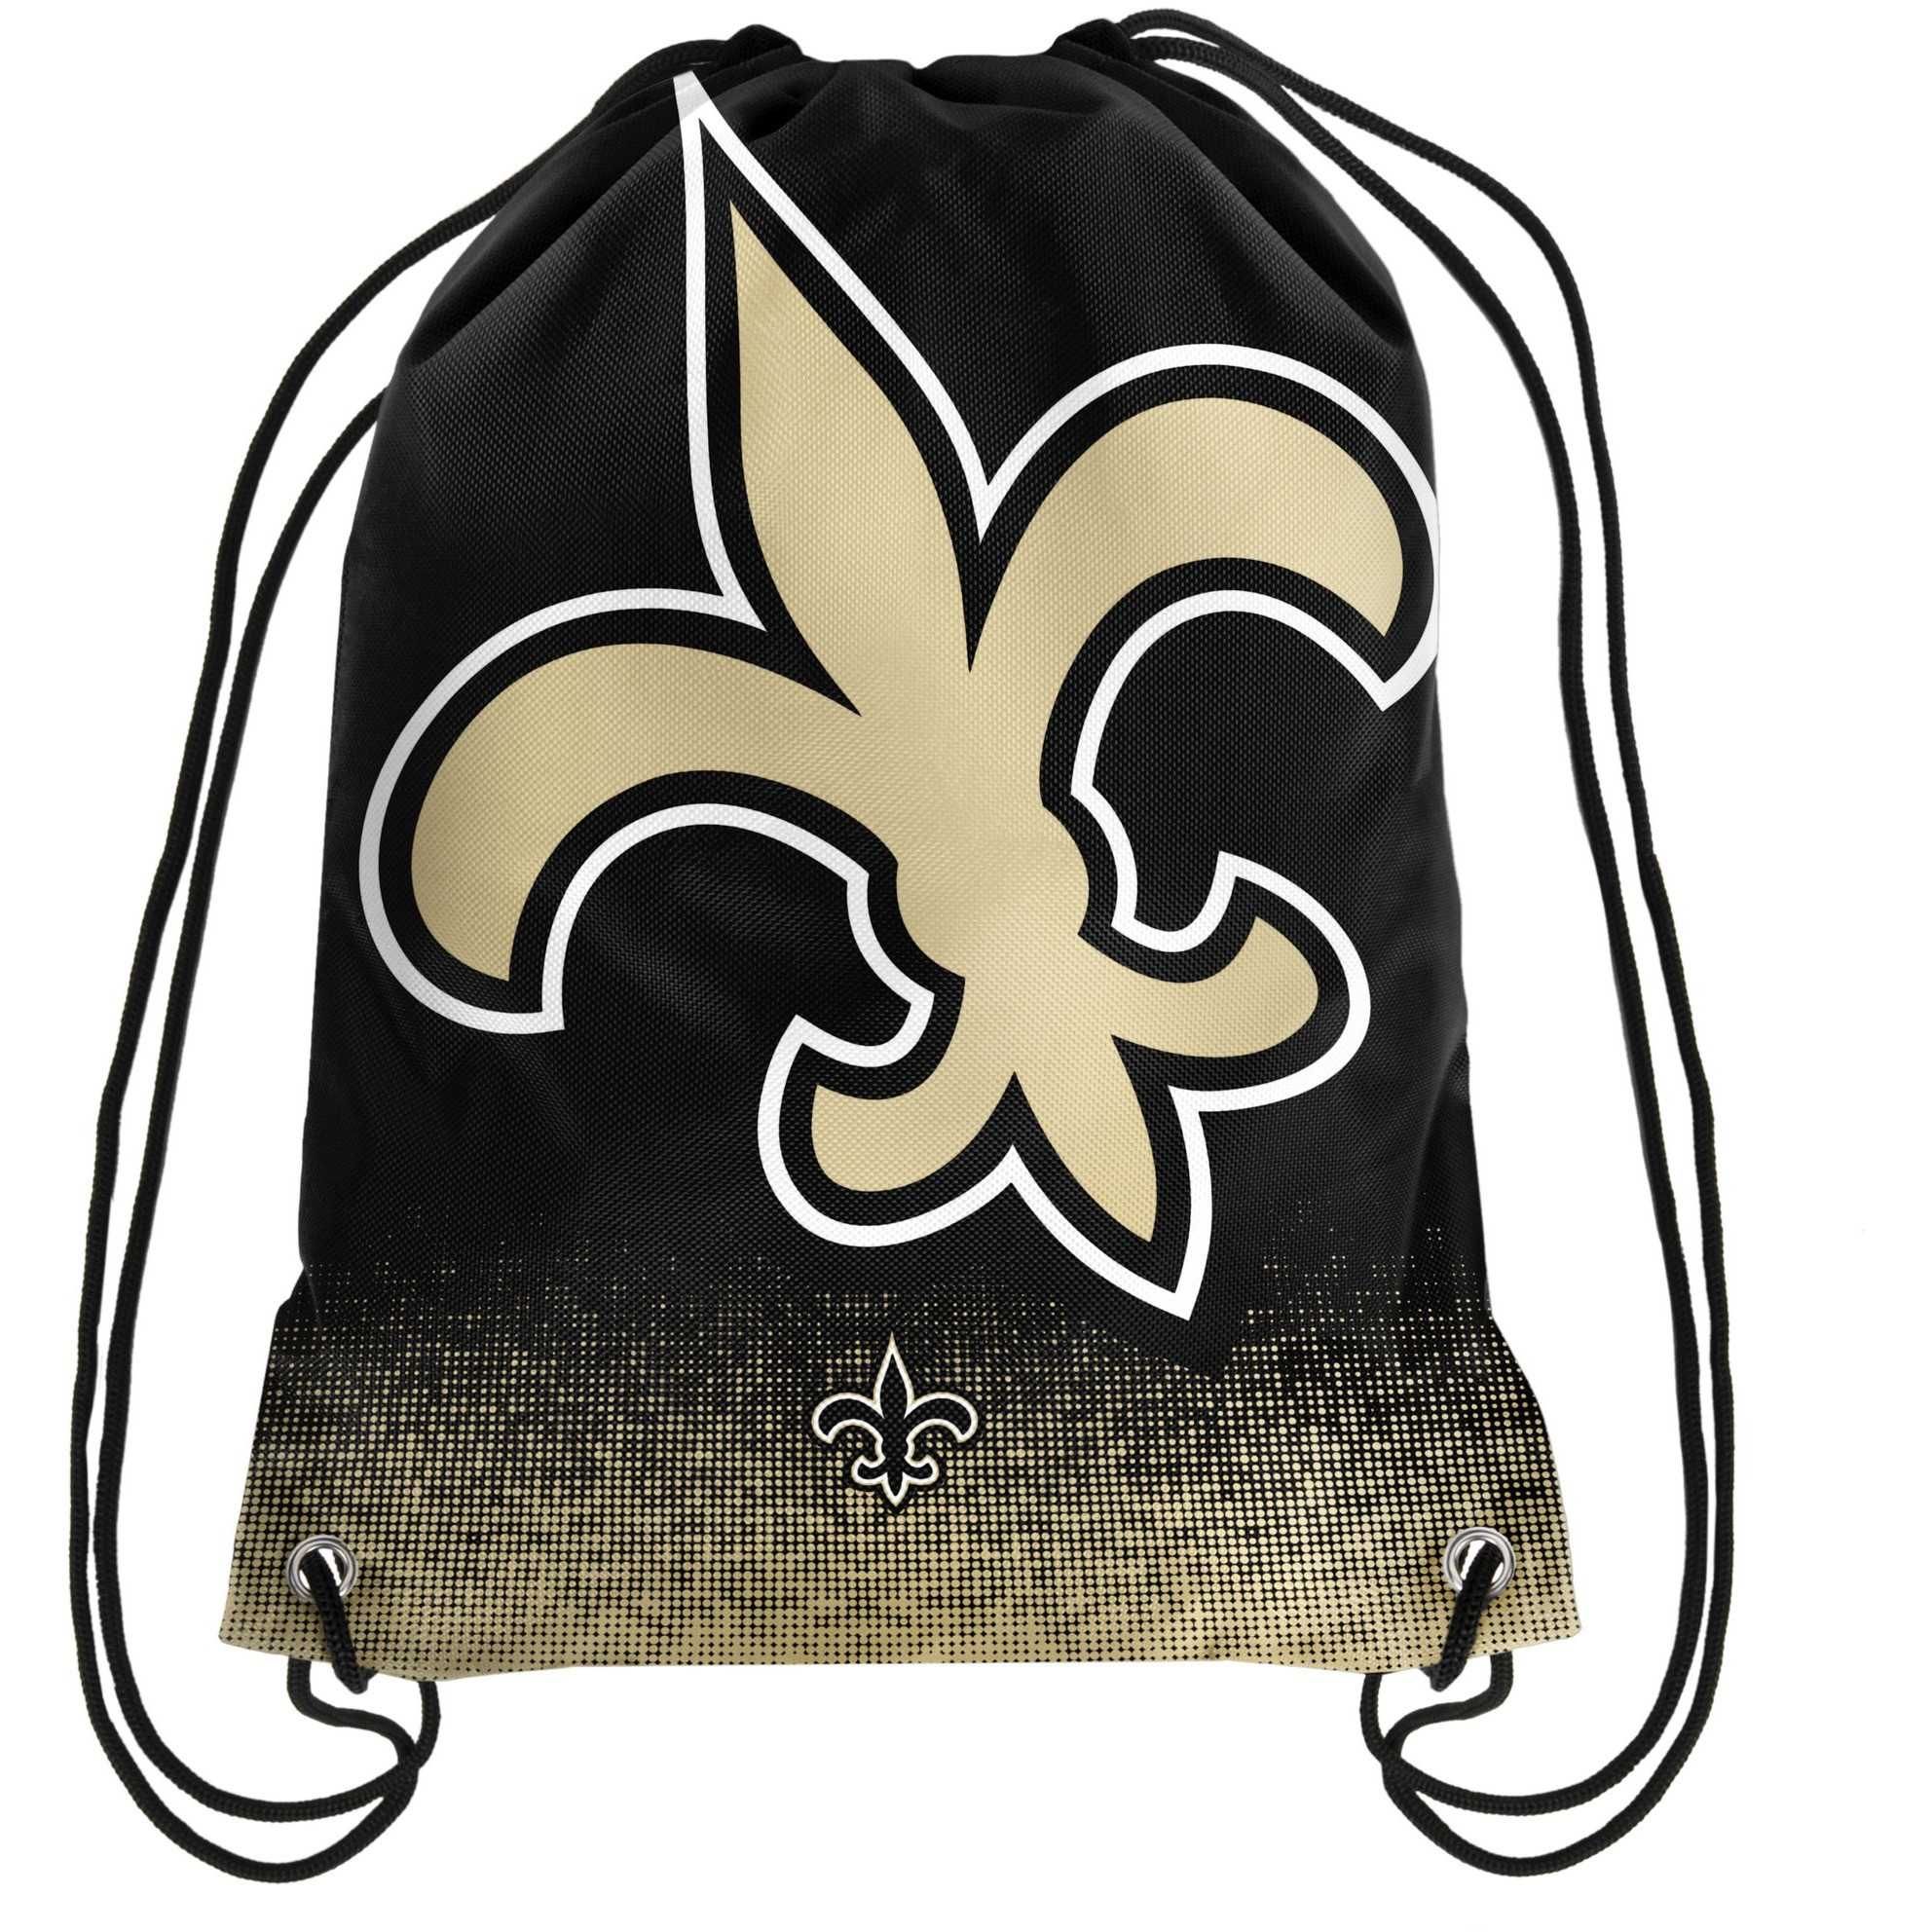 New Orleans Saints NFL Gradient Drawstring Backpack